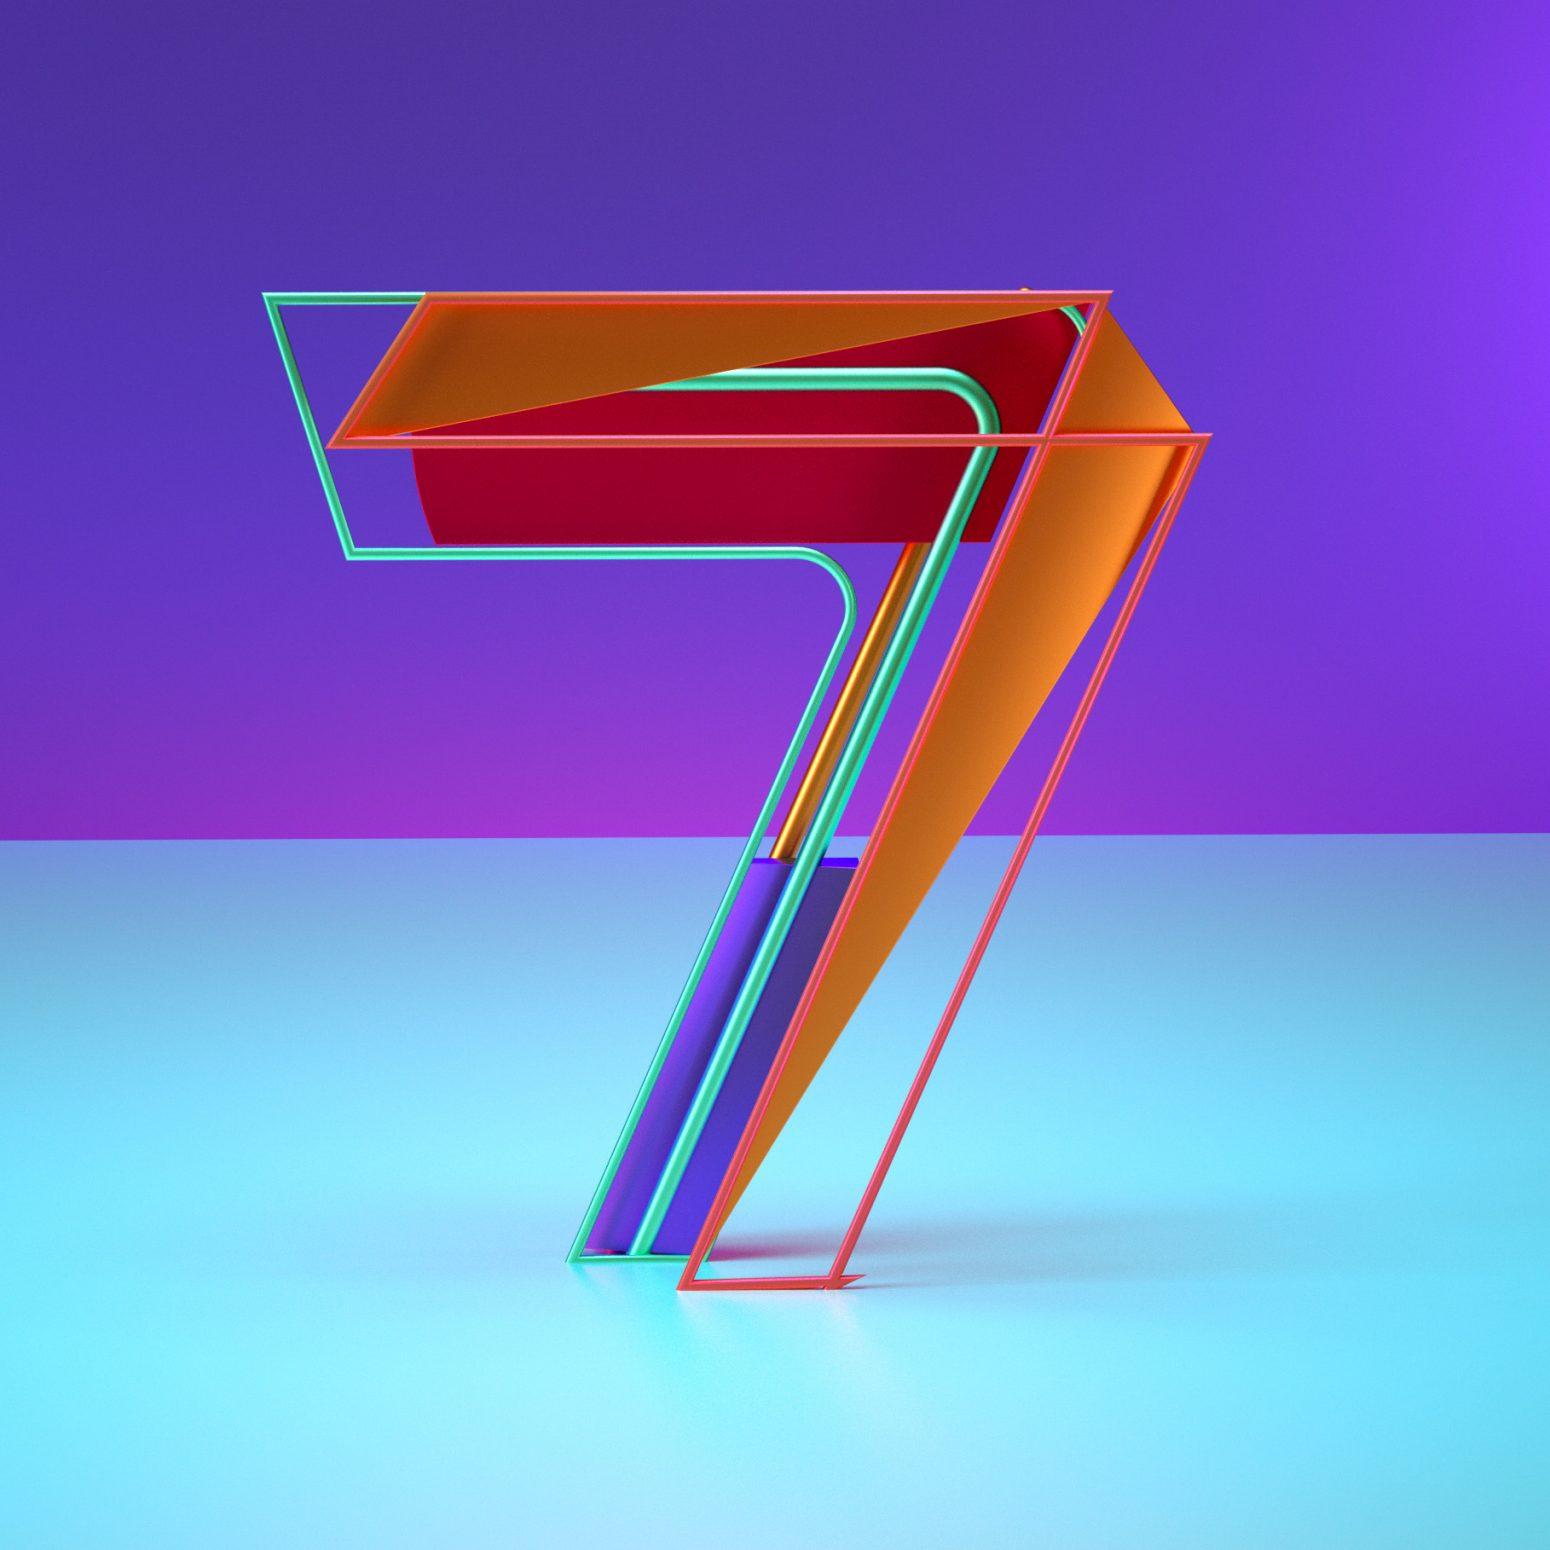 letter 7 designs